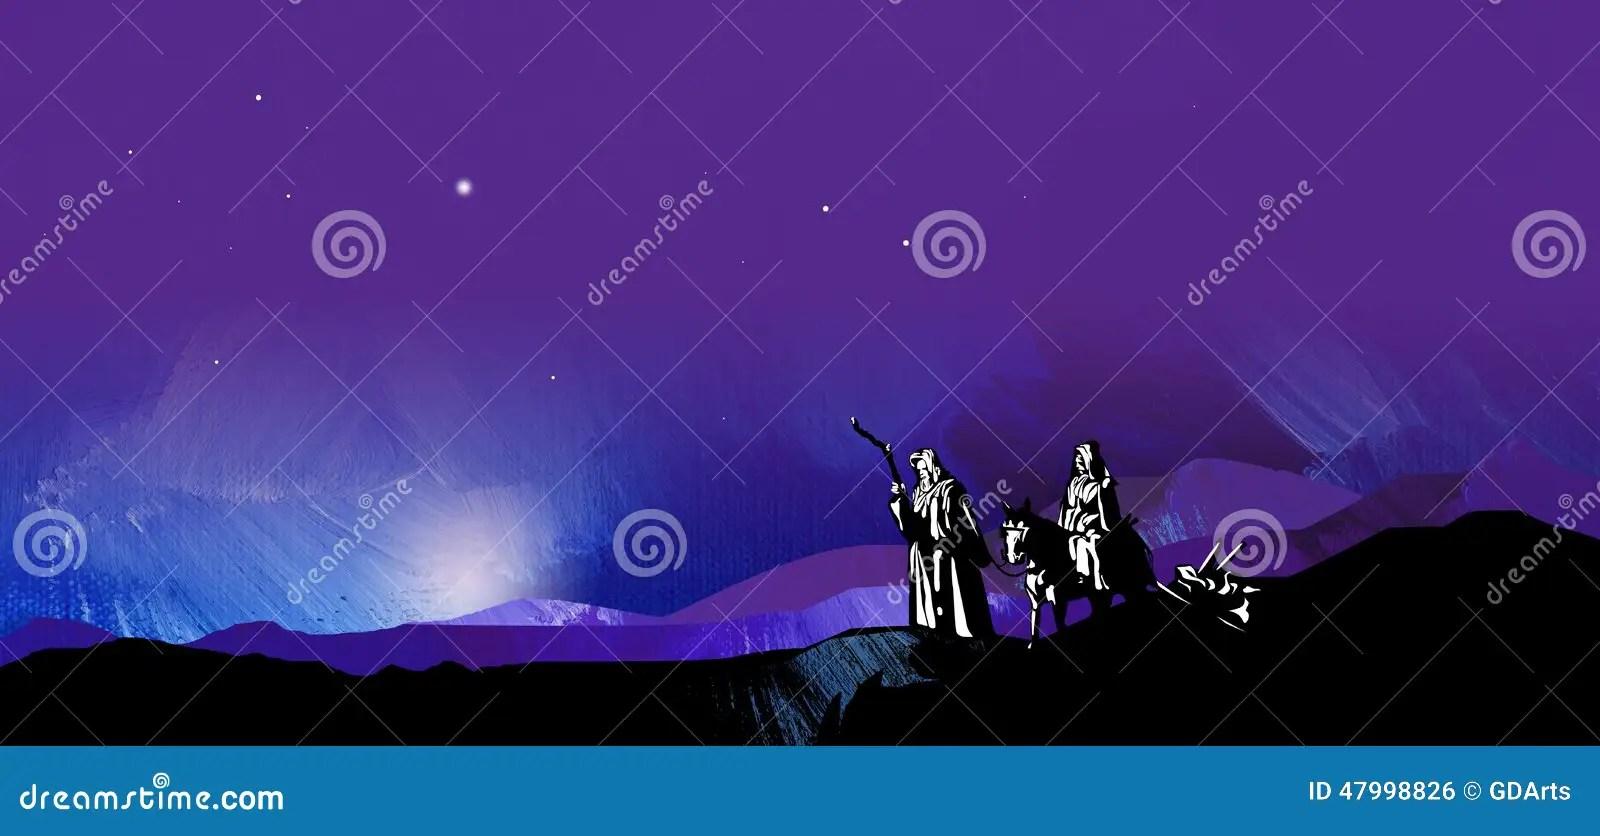 Graphic Starry Night Journey To Bethlehem Stock